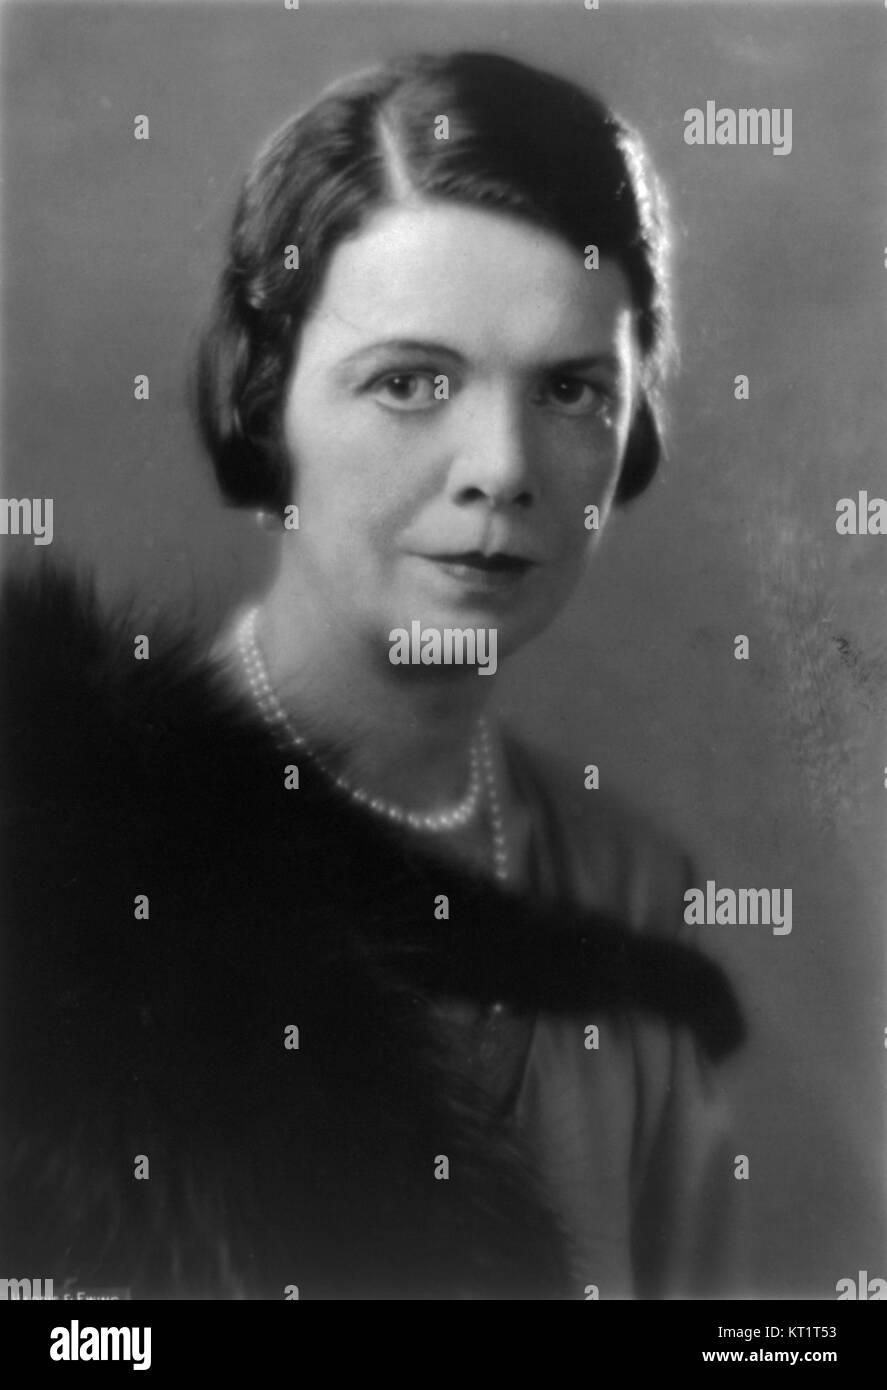 Joanna Dunham,Jane Horrocks (born 1964) Adult tube Paul Miller,Amy Fawsitt (1836-1876)